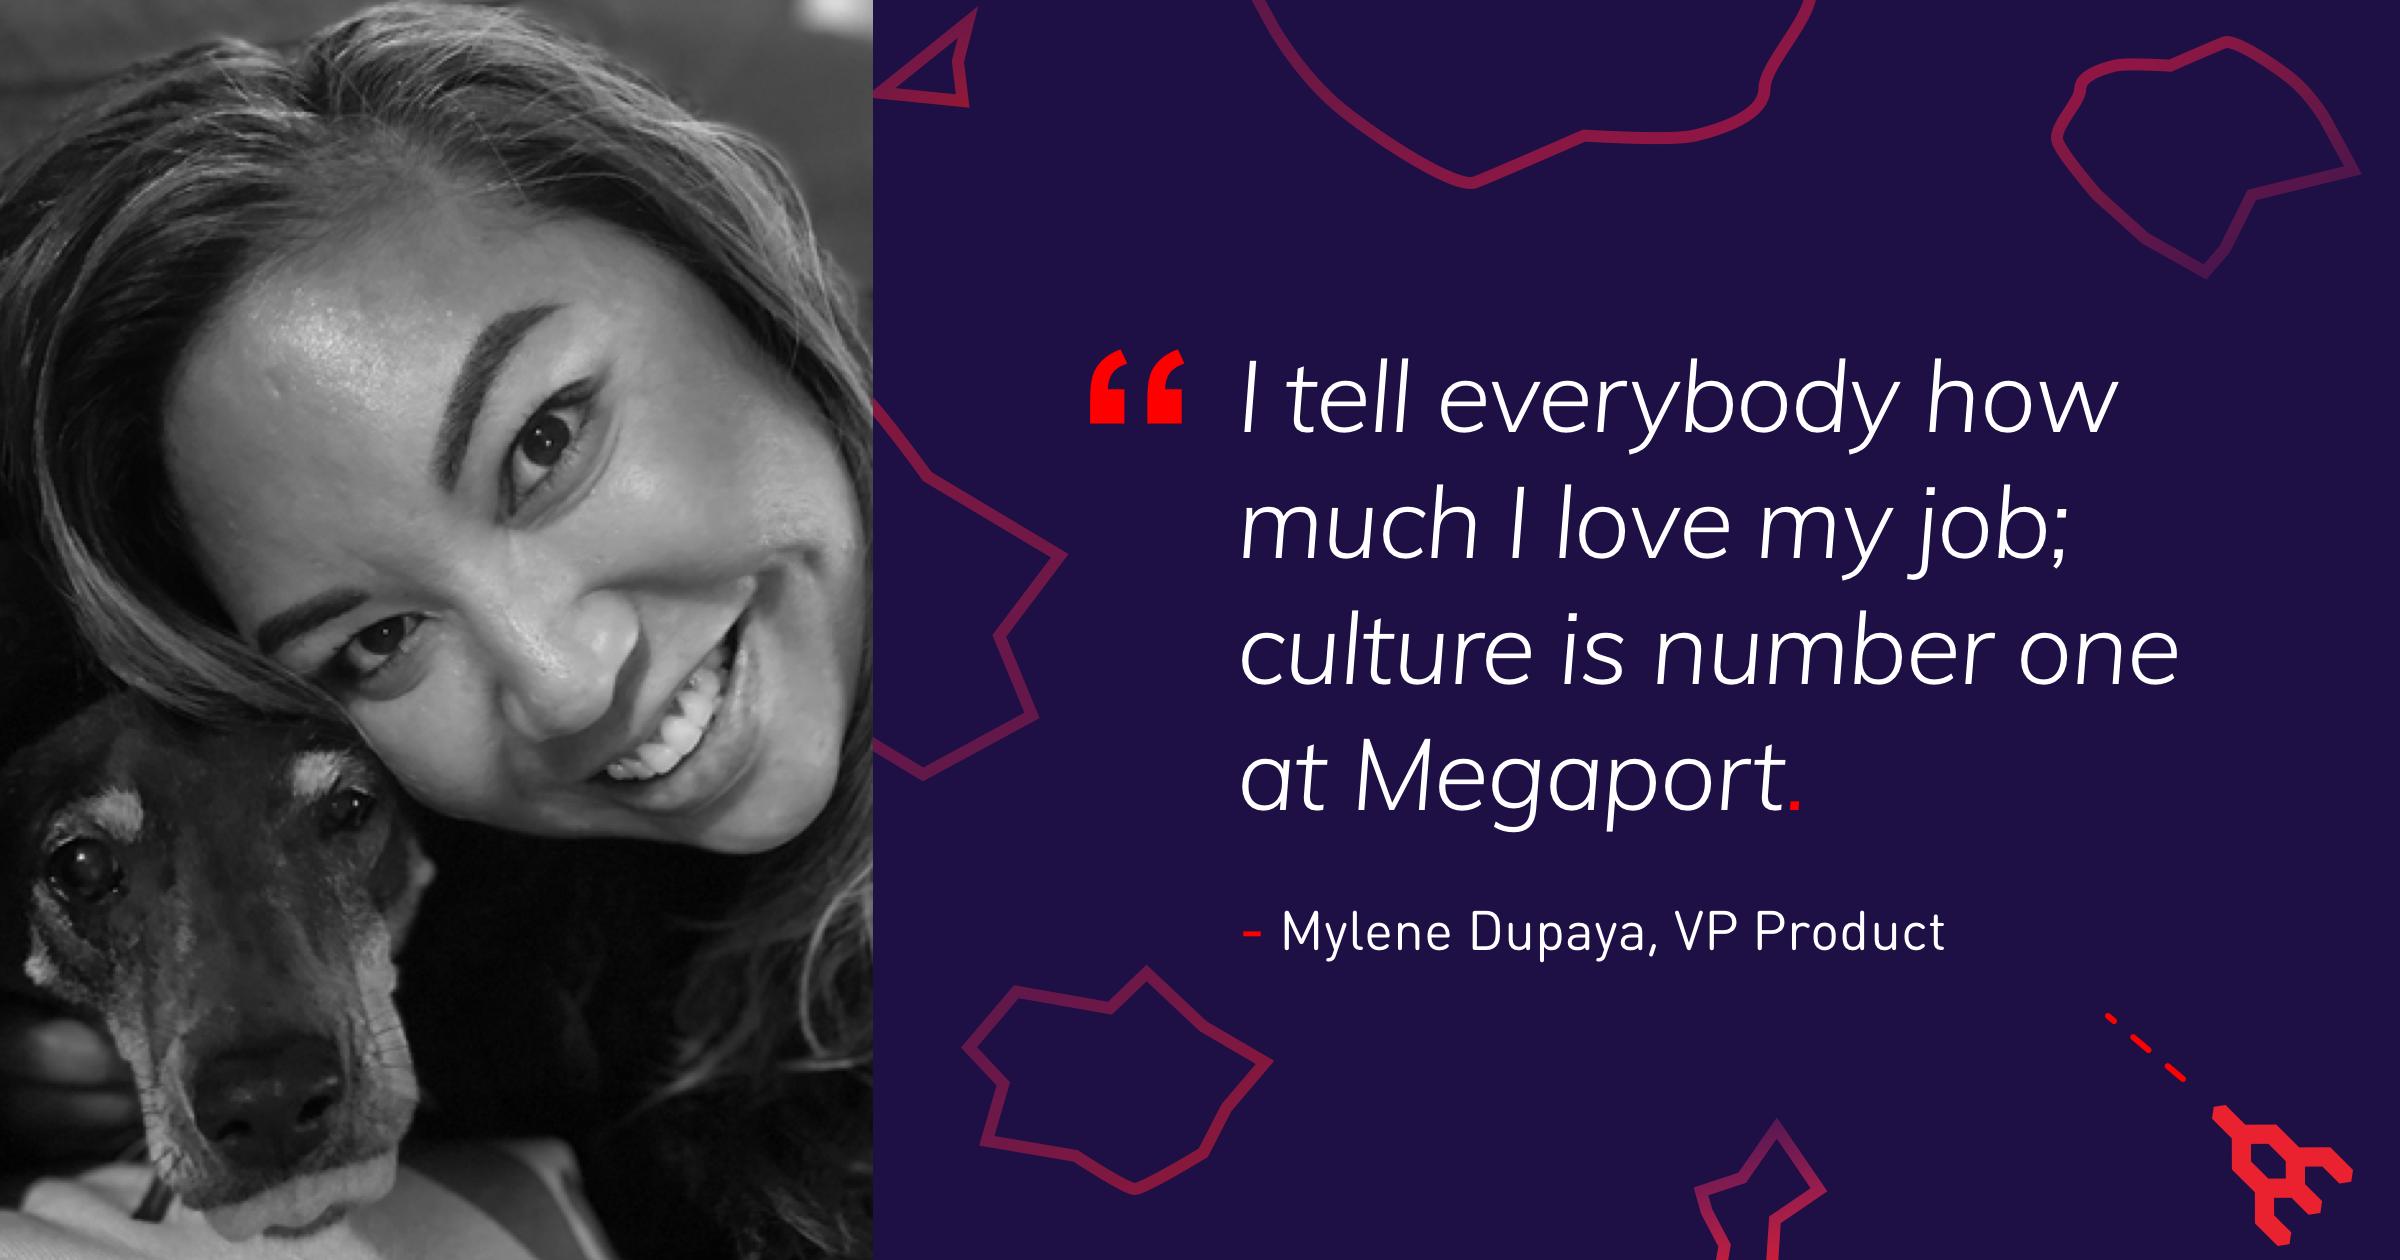 Megaport Success Stories_Mylene Dupaya quote